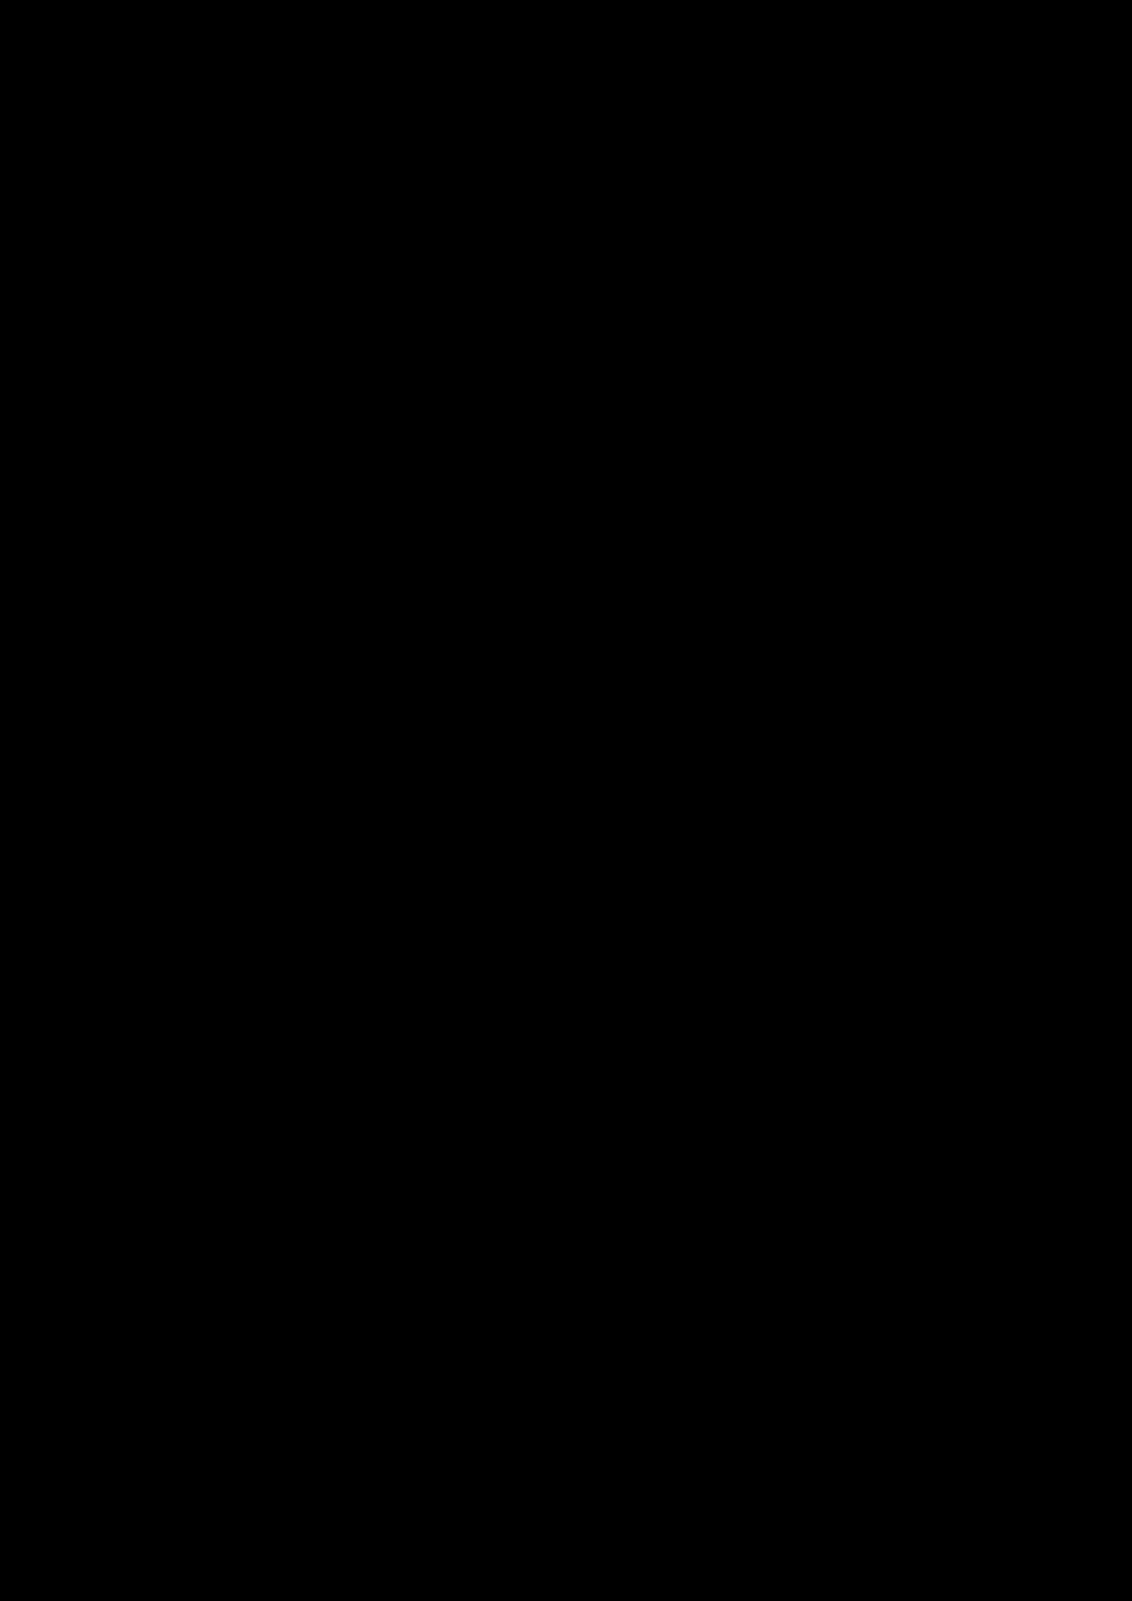 Ot Bolshogo Uma slide, Image 6